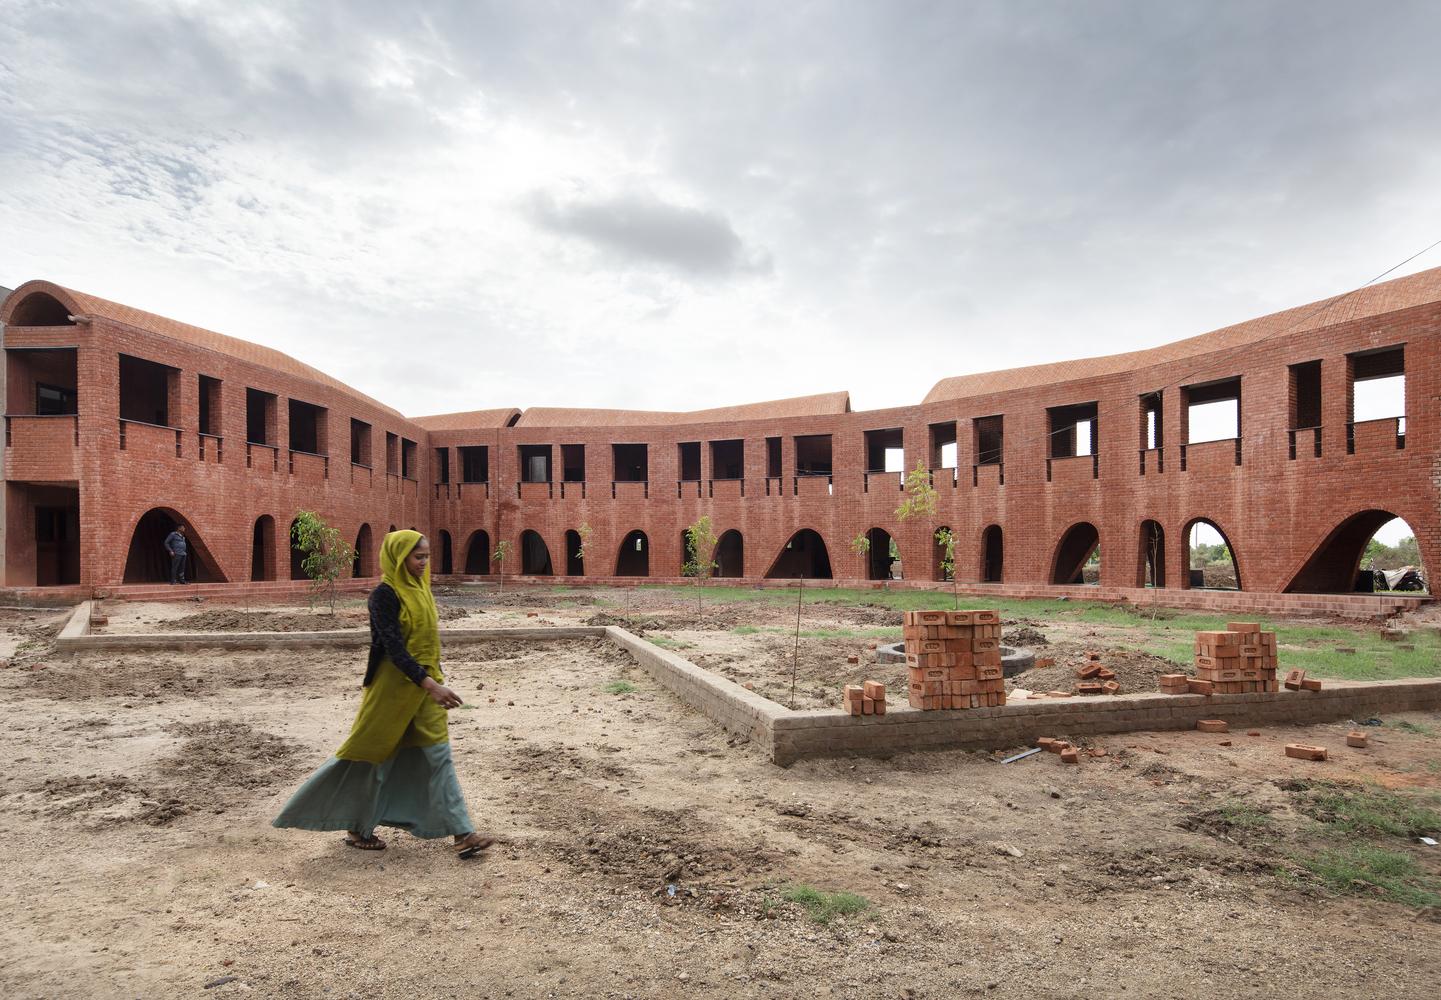 School of Dancing Arches / Samira Rathod Design Associates